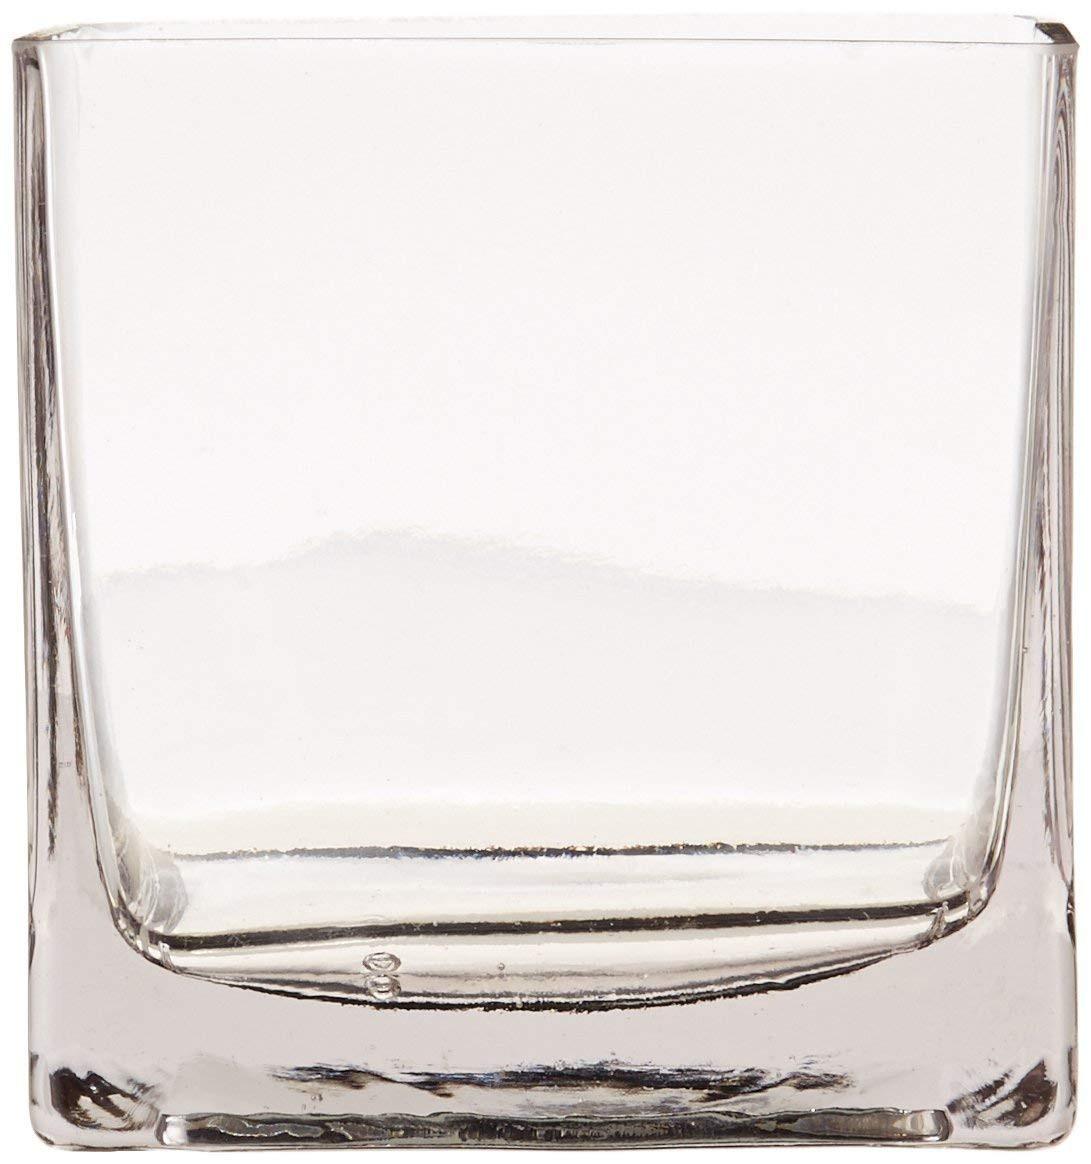 clear plastic vases in bulk of amazon com 12piece 4 square crystal clear glass vase home kitchen inside 61odrrfbtgl sl1164